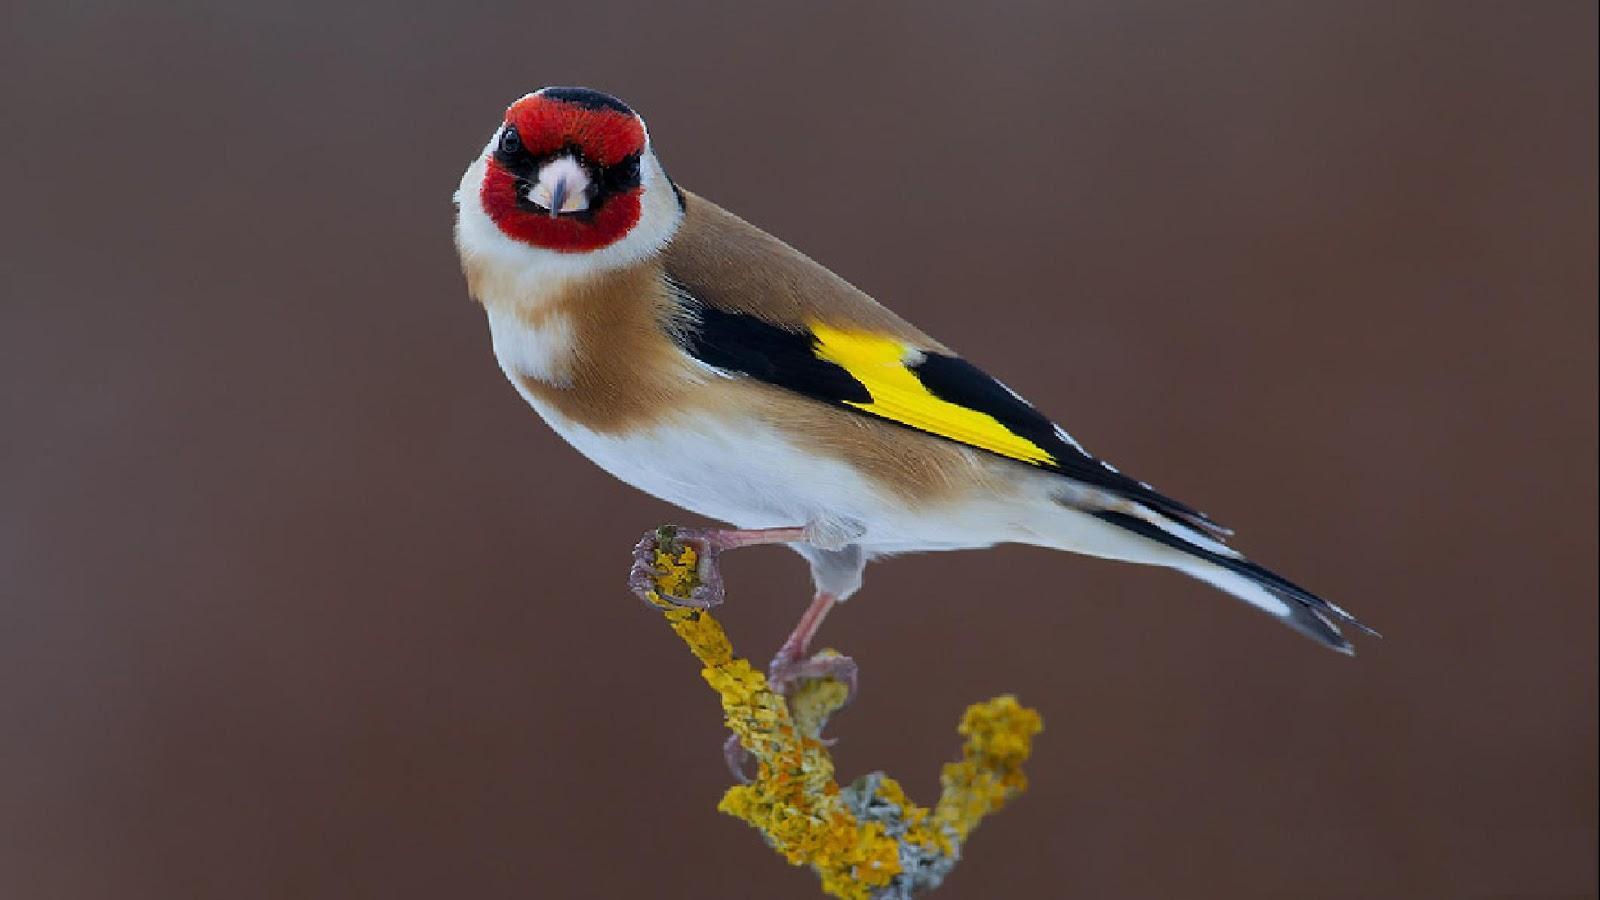 صور صور كناري , صور و خلفيات لطائر الكناري